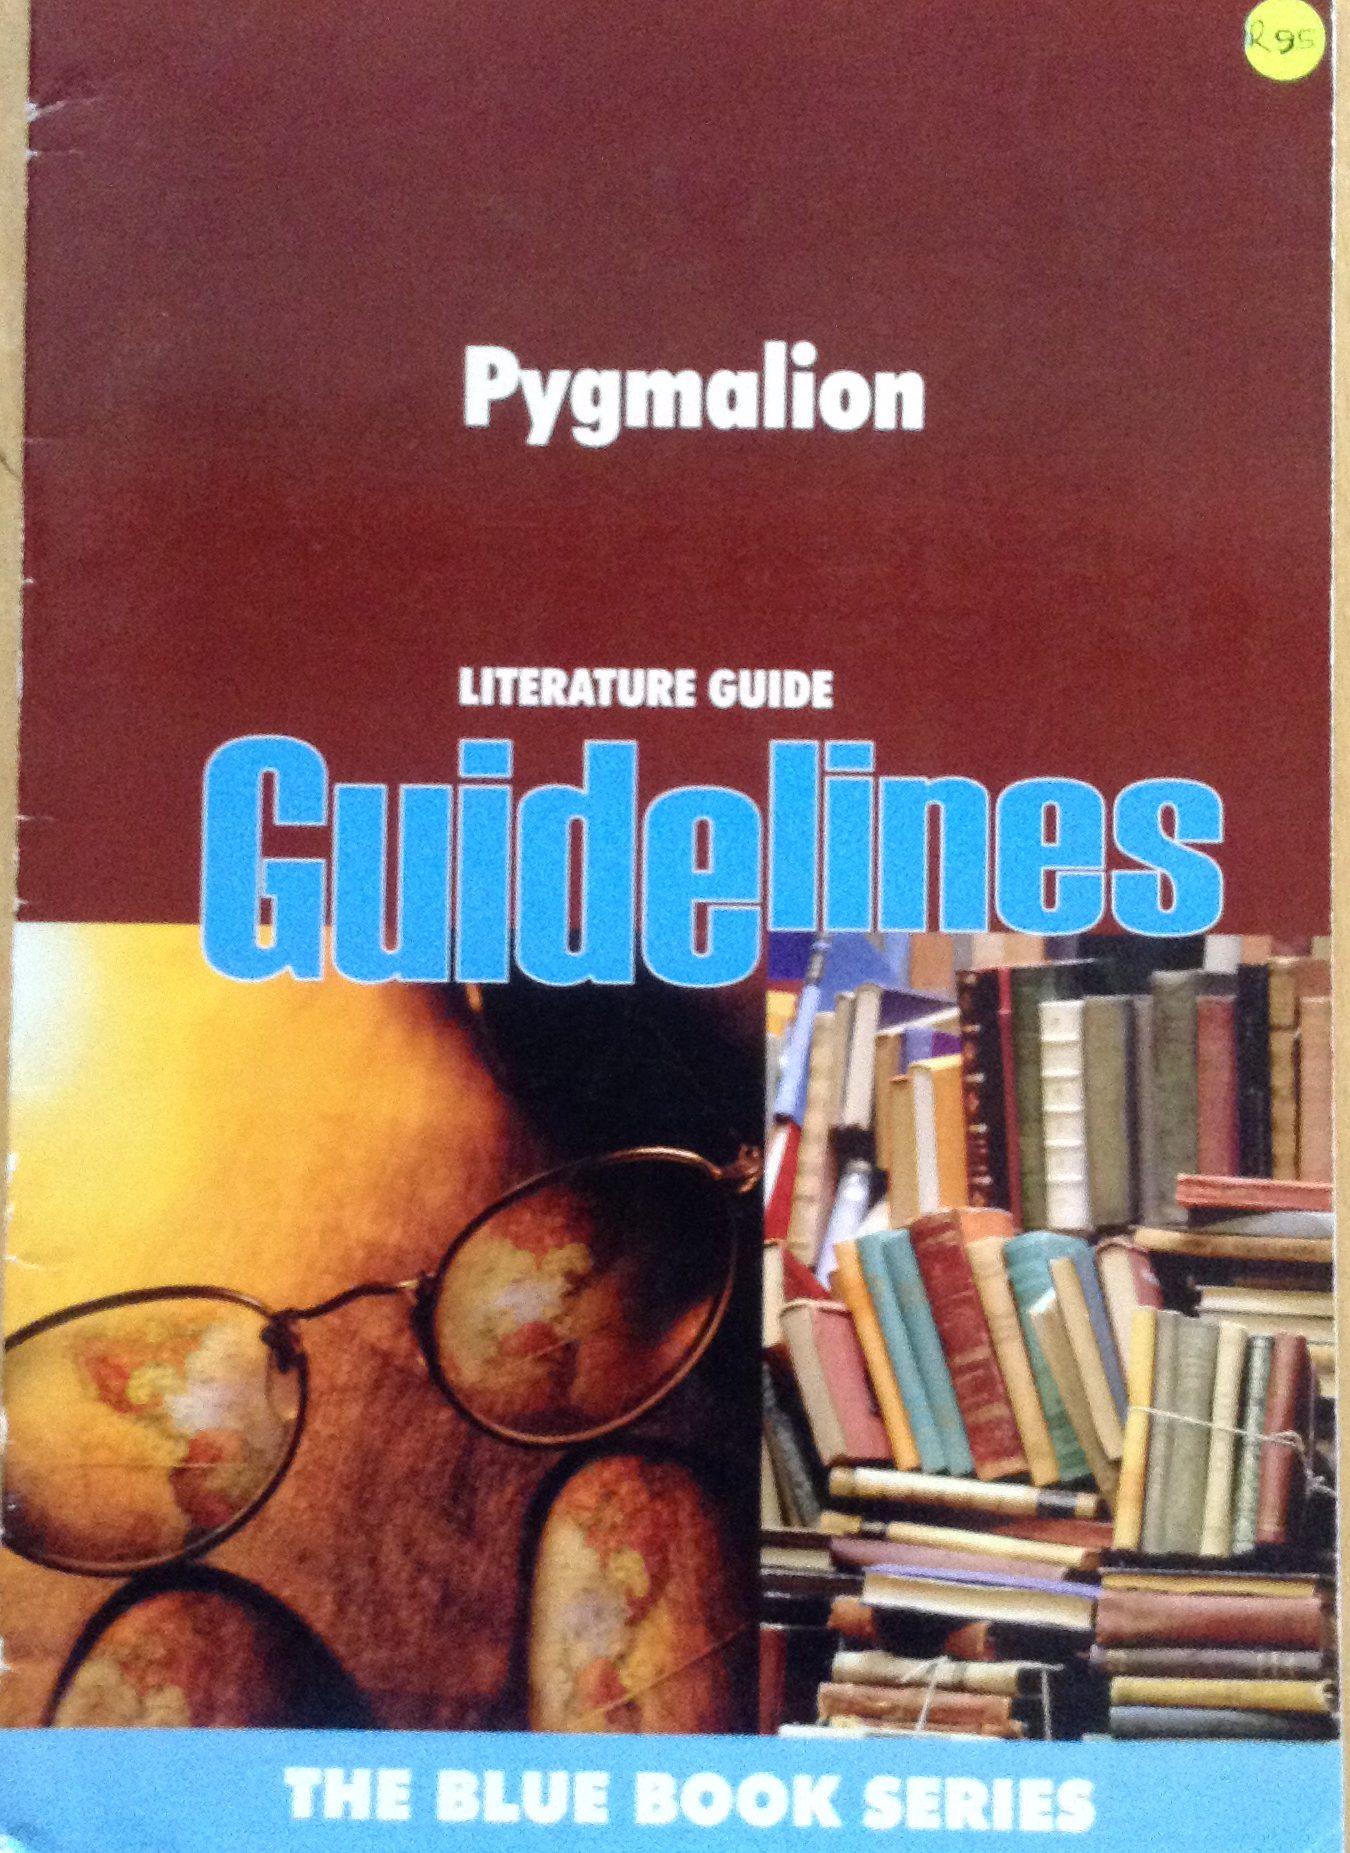 Pygmalion ...